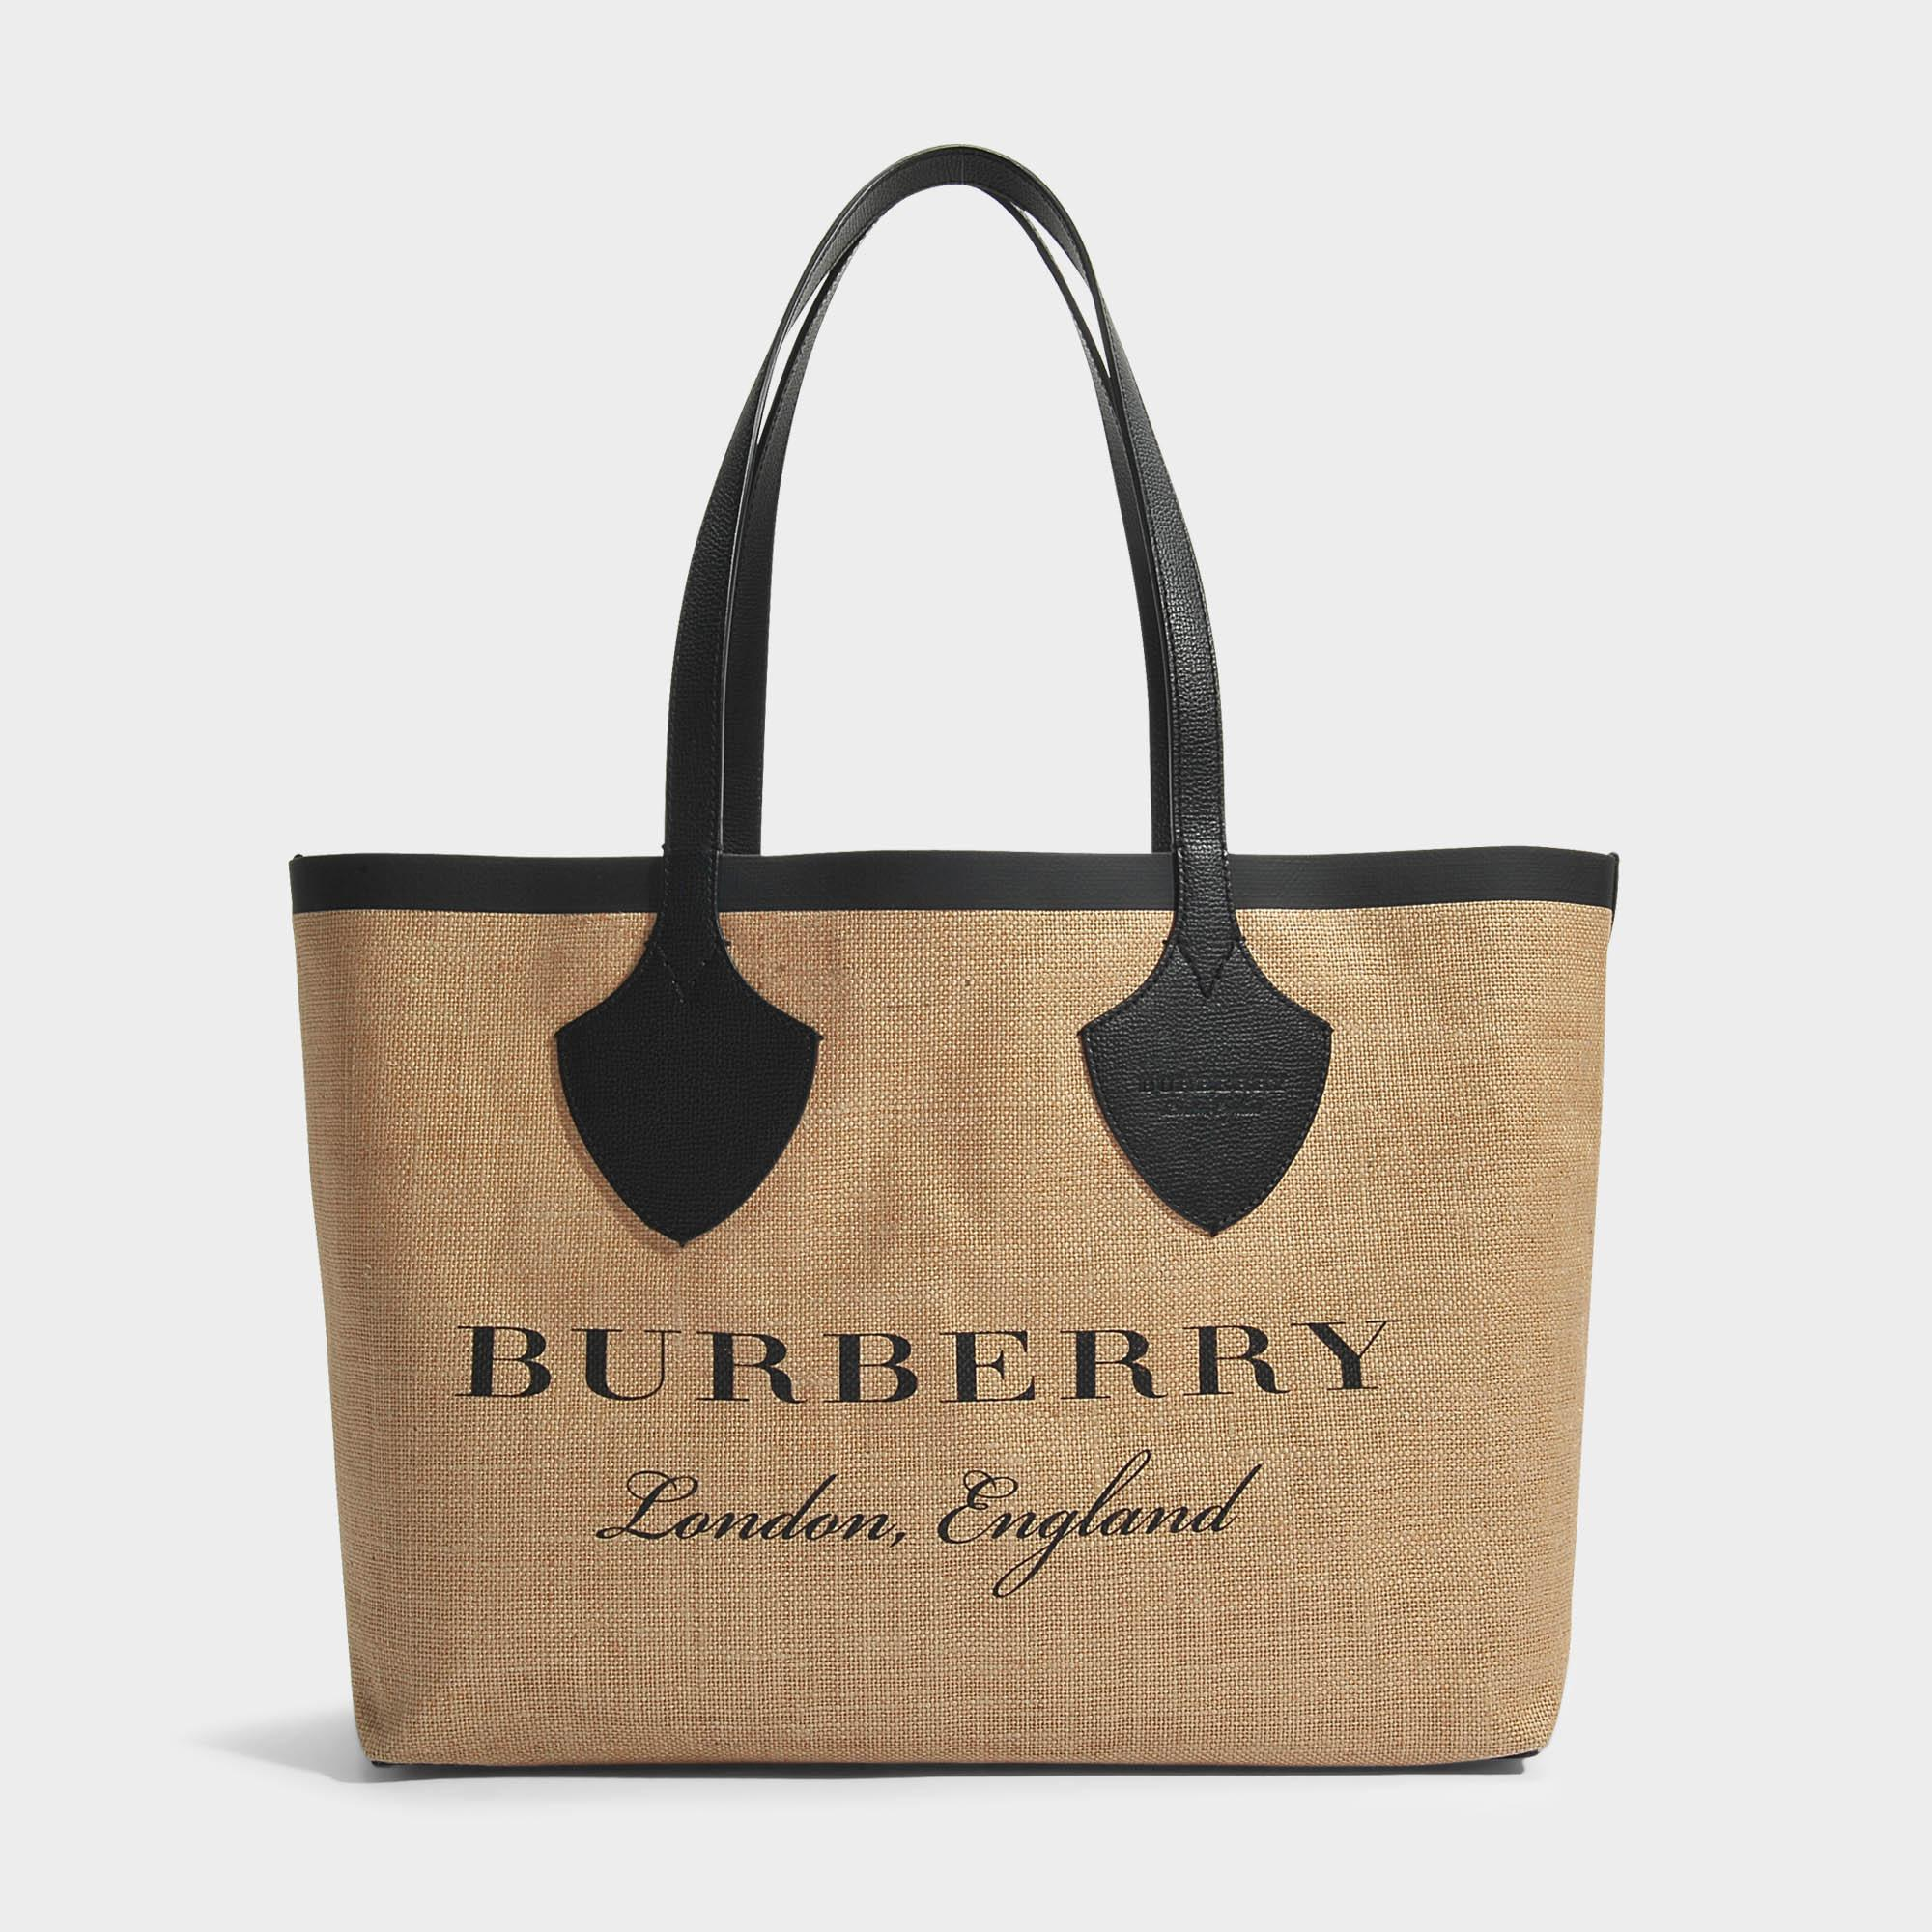 The Giant Medium Tote Bag in Chalk White Jute Stripes Burberry NEkRusA